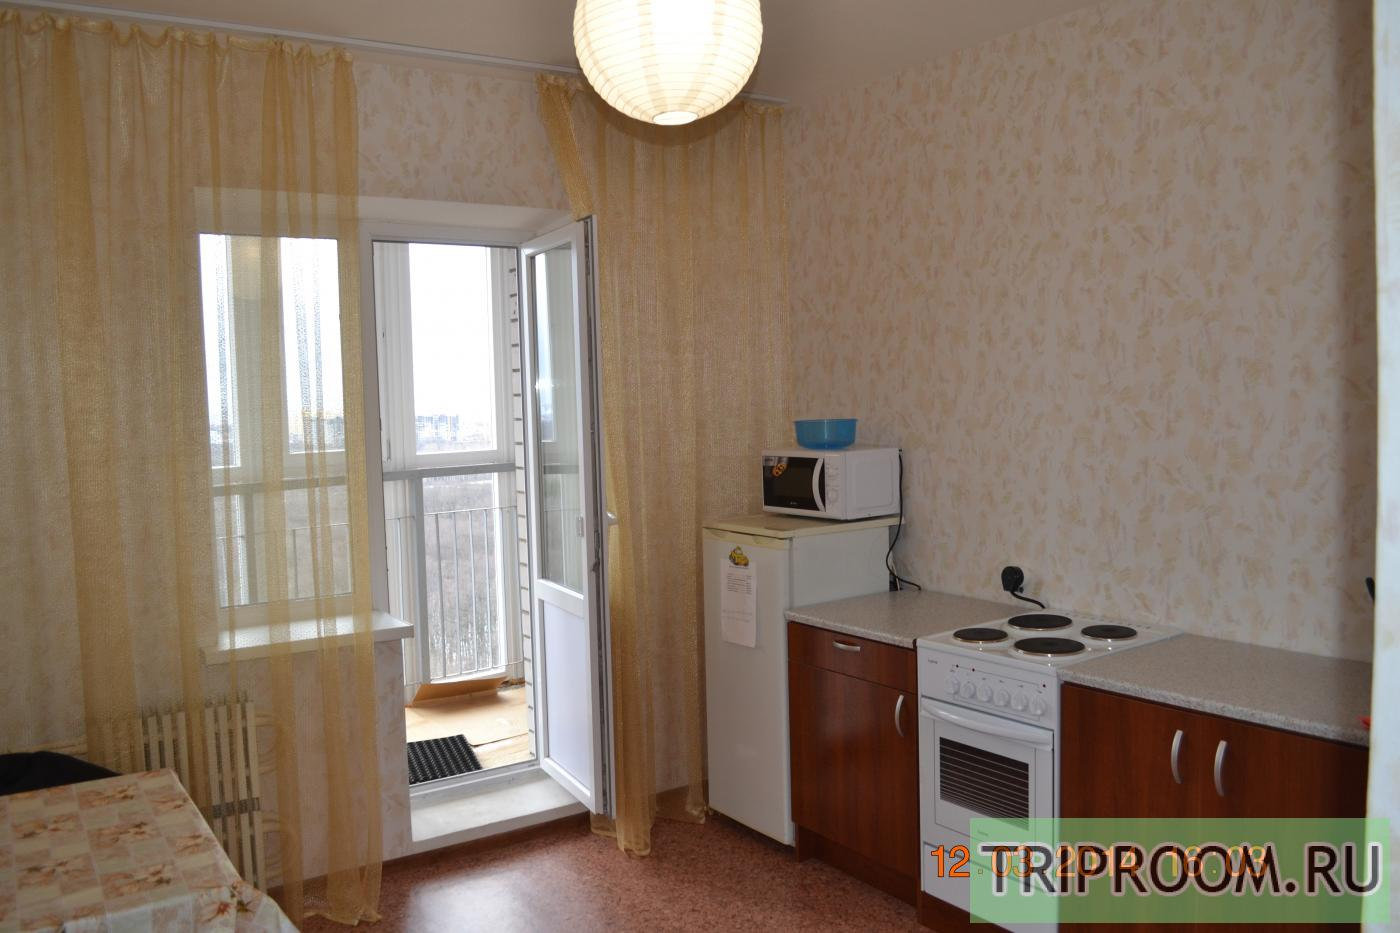 1-комнатная квартира посуточно (вариант № 4803), ул. Ломоносова улица, фото № 5